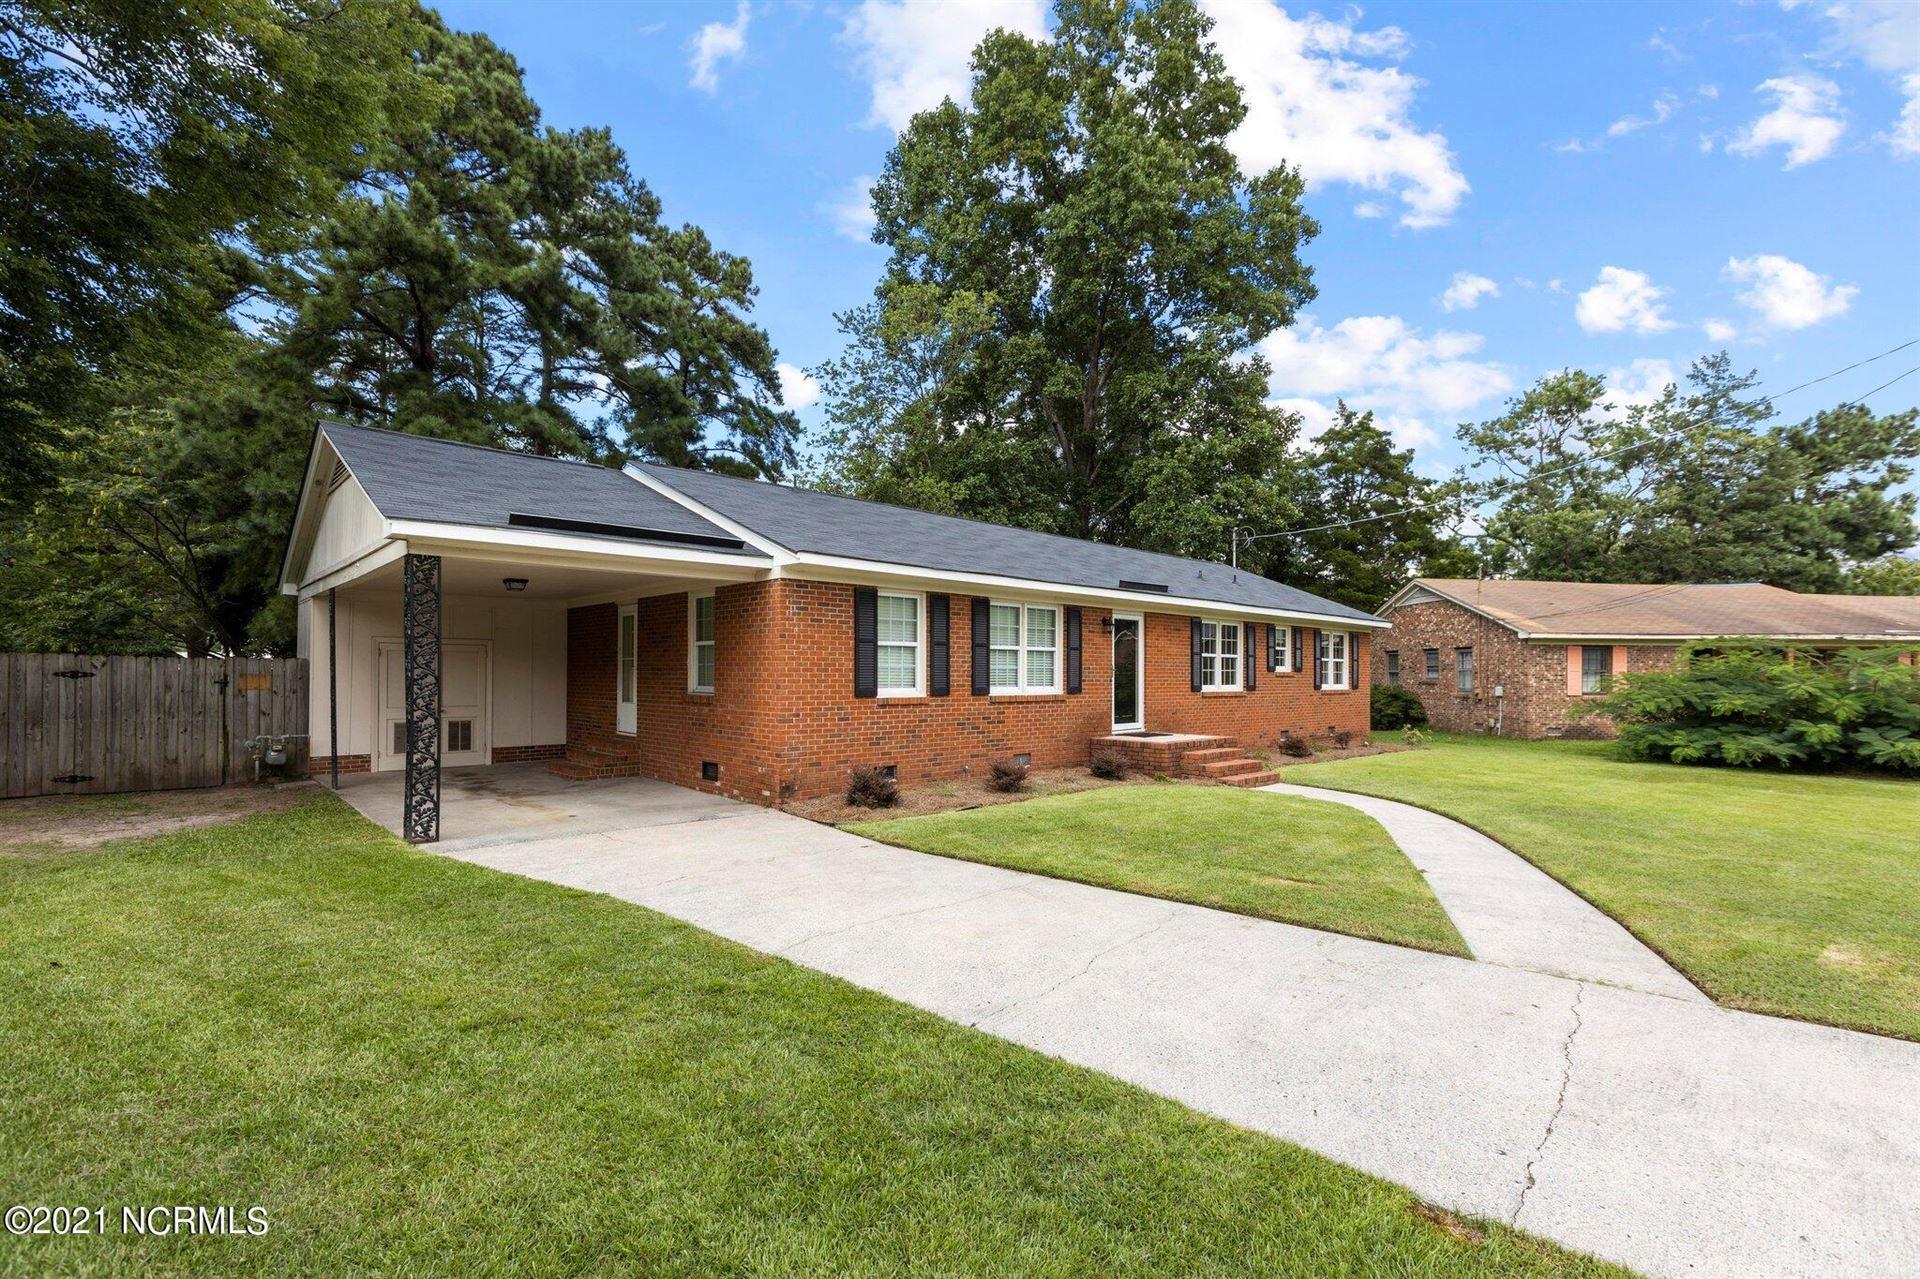 Photo of 105 Templeton Drive, Greenville, NC 27858 (MLS # 100291462)